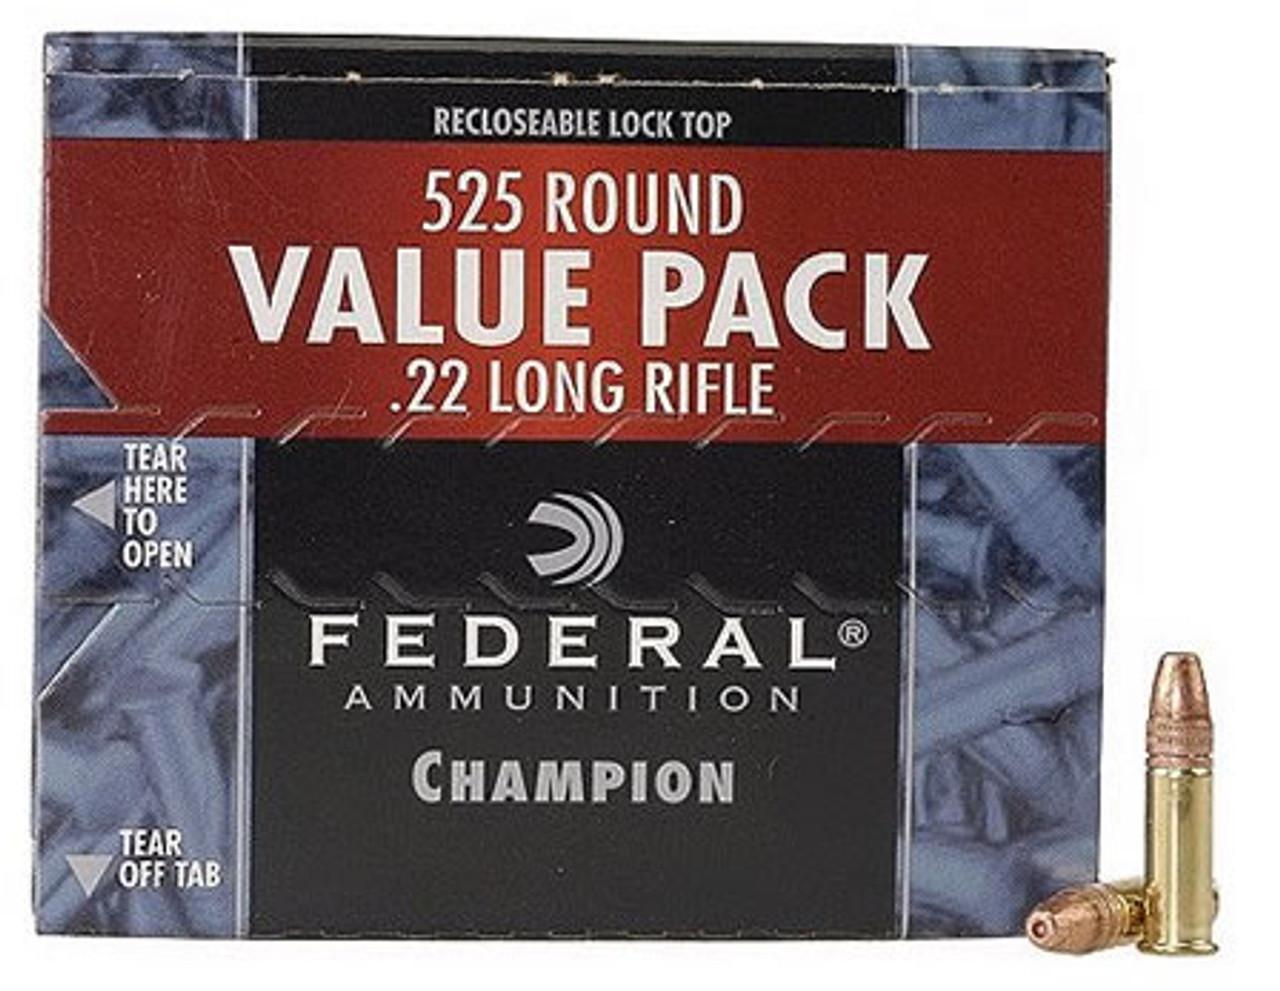 Federal Champion 22LR Case of 5250